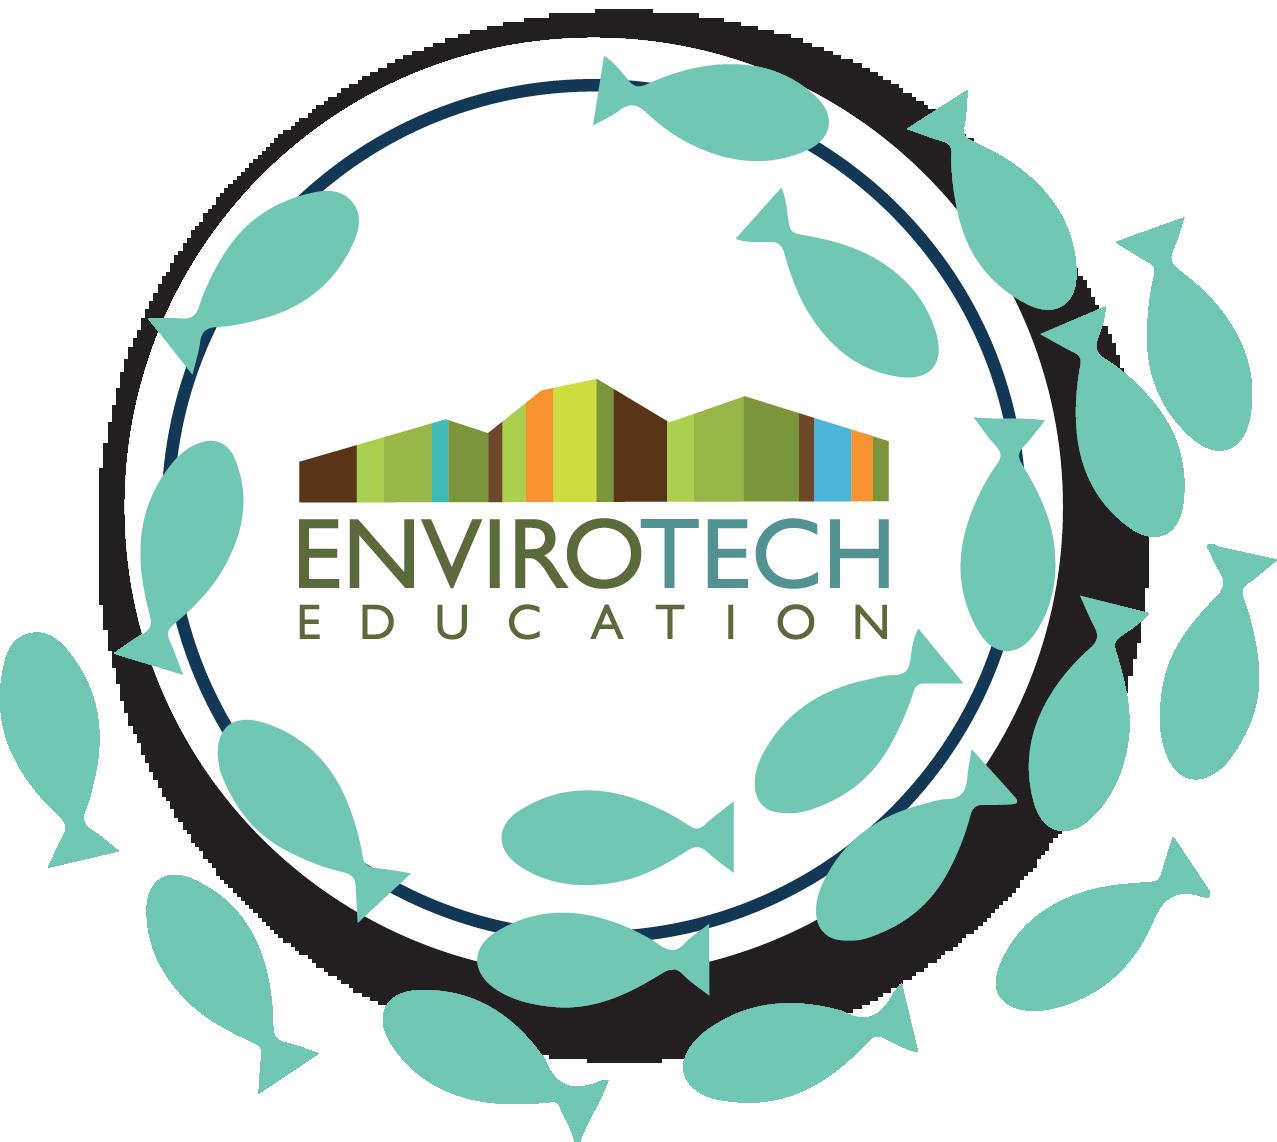 Envirotech Education